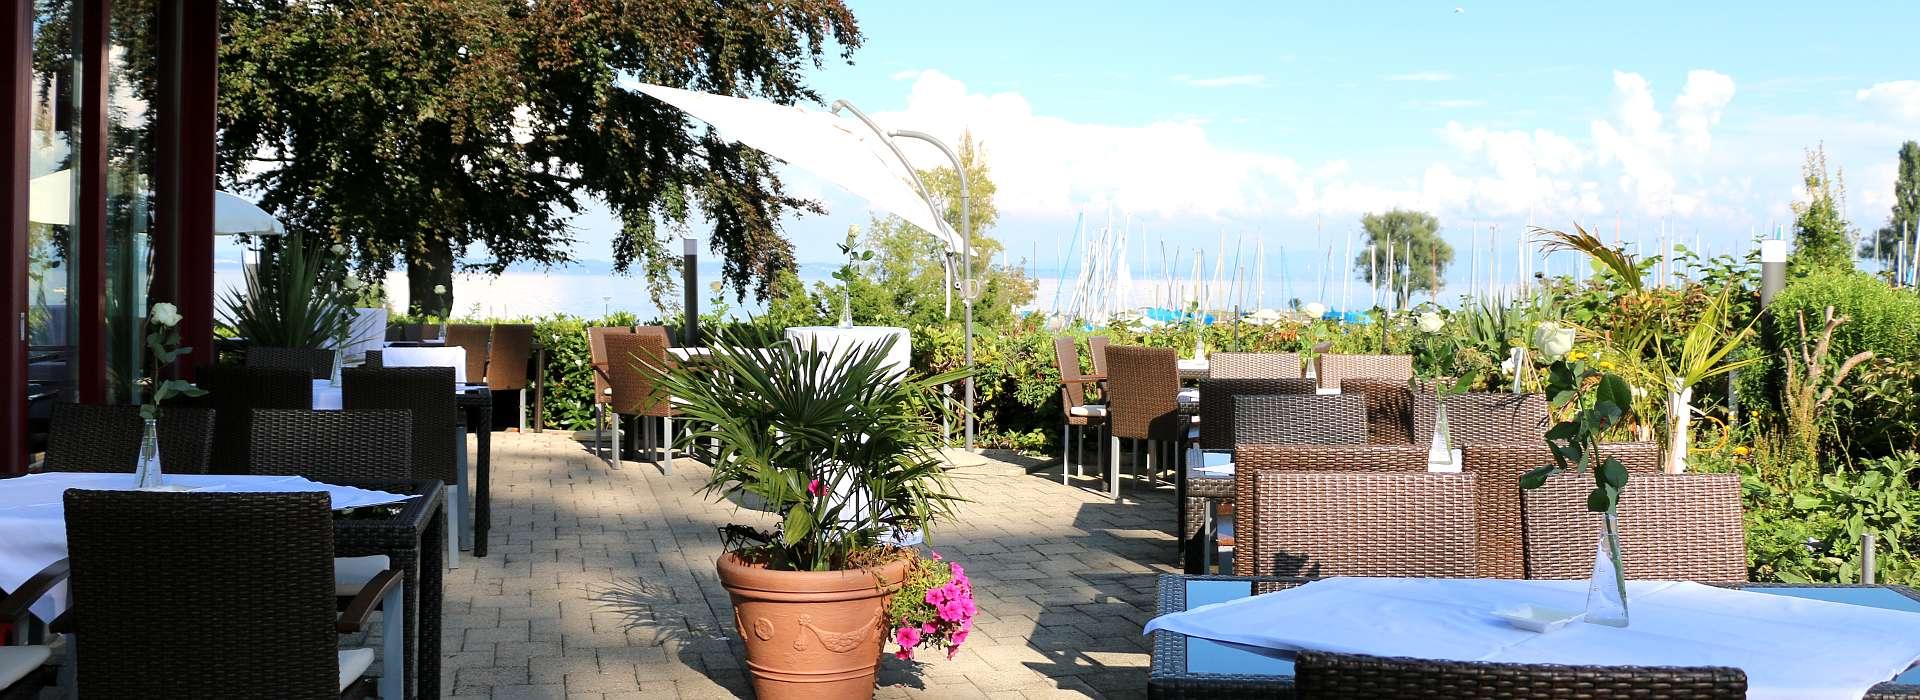 Terasse 01 - Park-Hotel Inseli - IMG_3459 - 1920x700